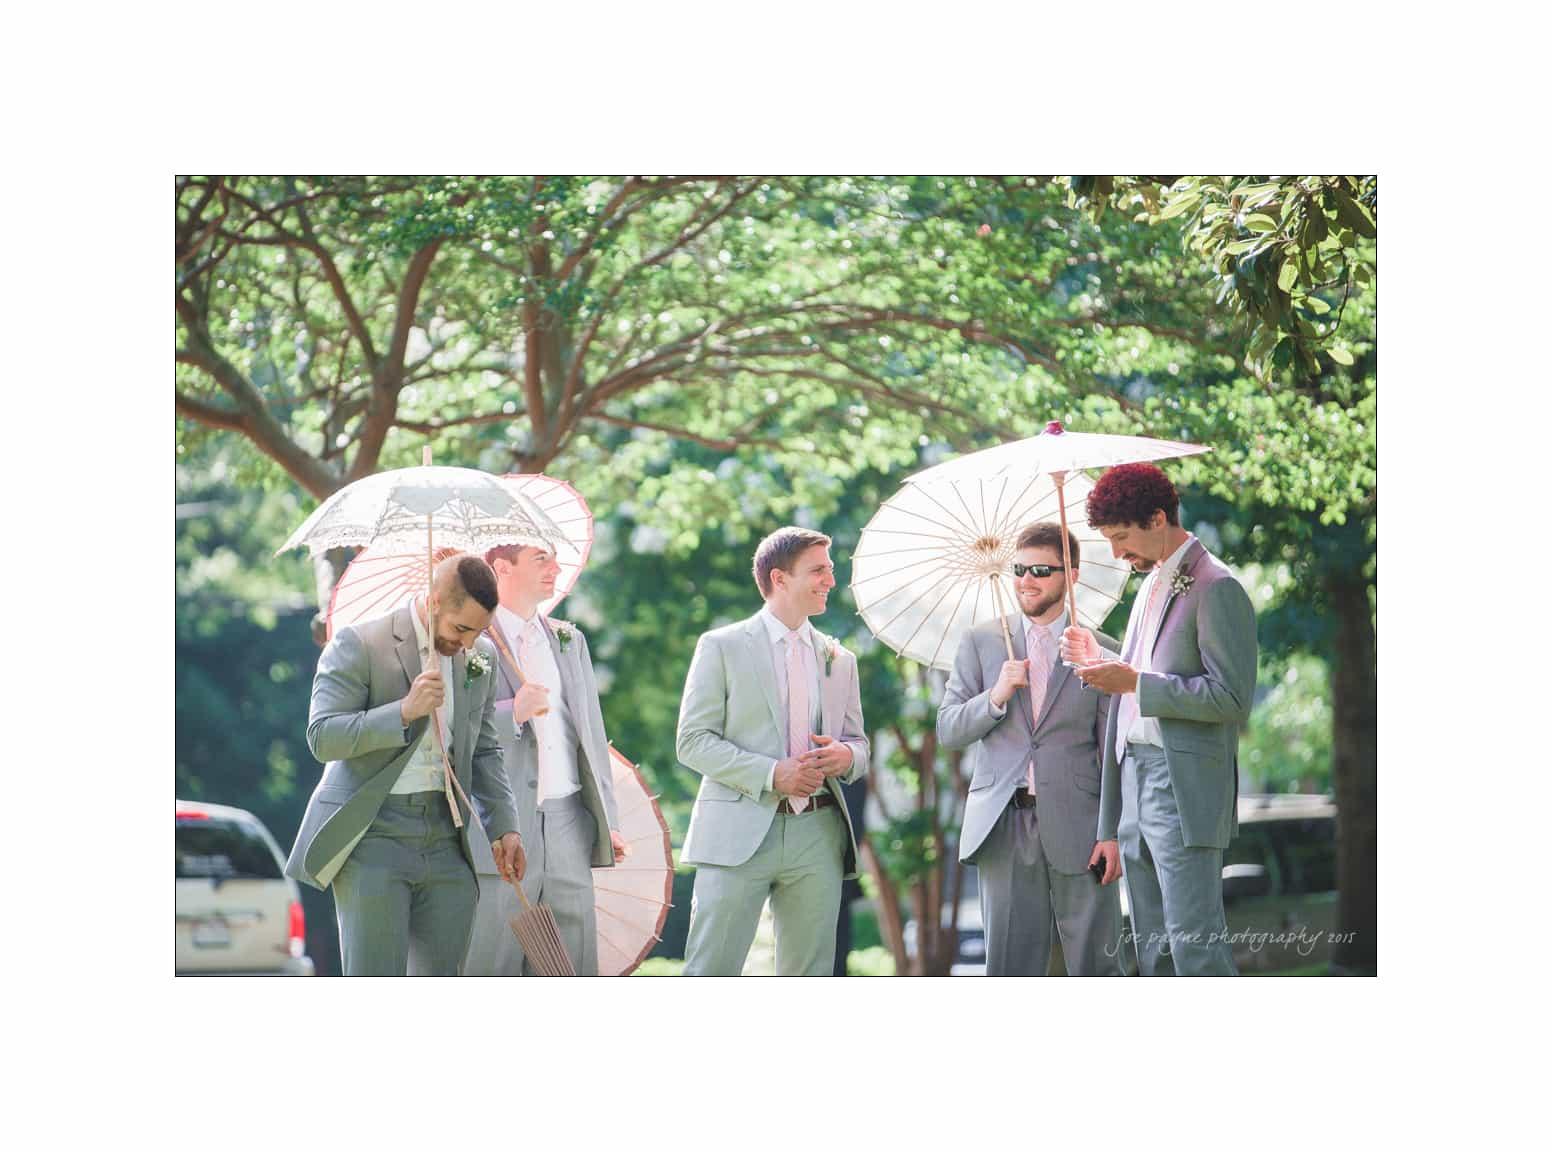 nc wedding photographer groomsmen with parasols